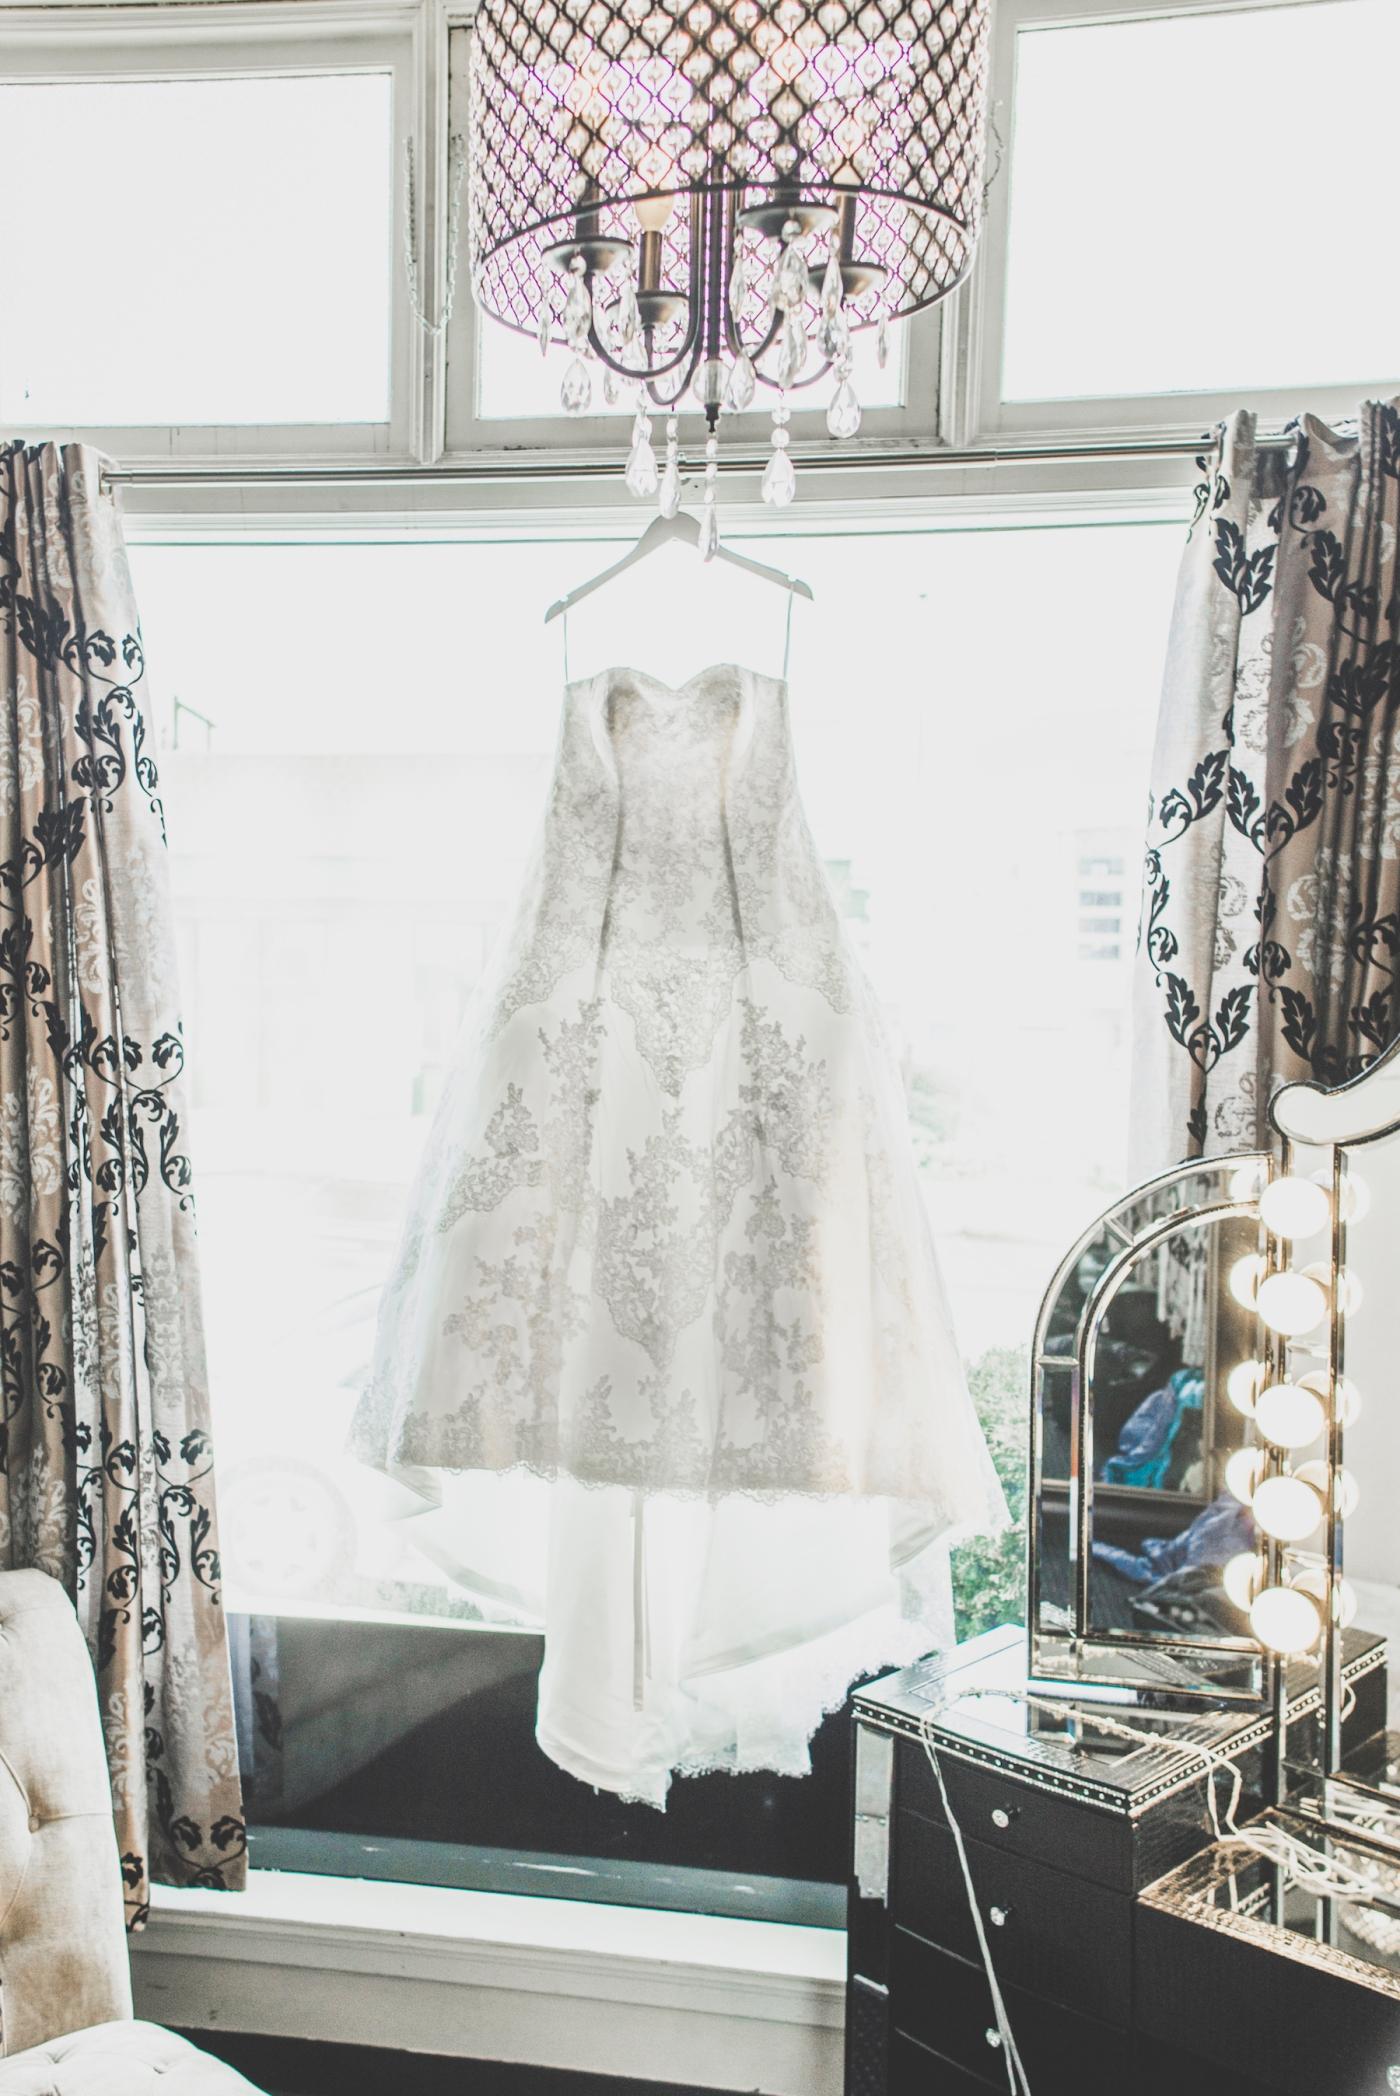 DSC_1751Everett_Wedding_Ballroom_Jane_Speleers_photography_Rachel_and_Edmund_Getting_ready_2017